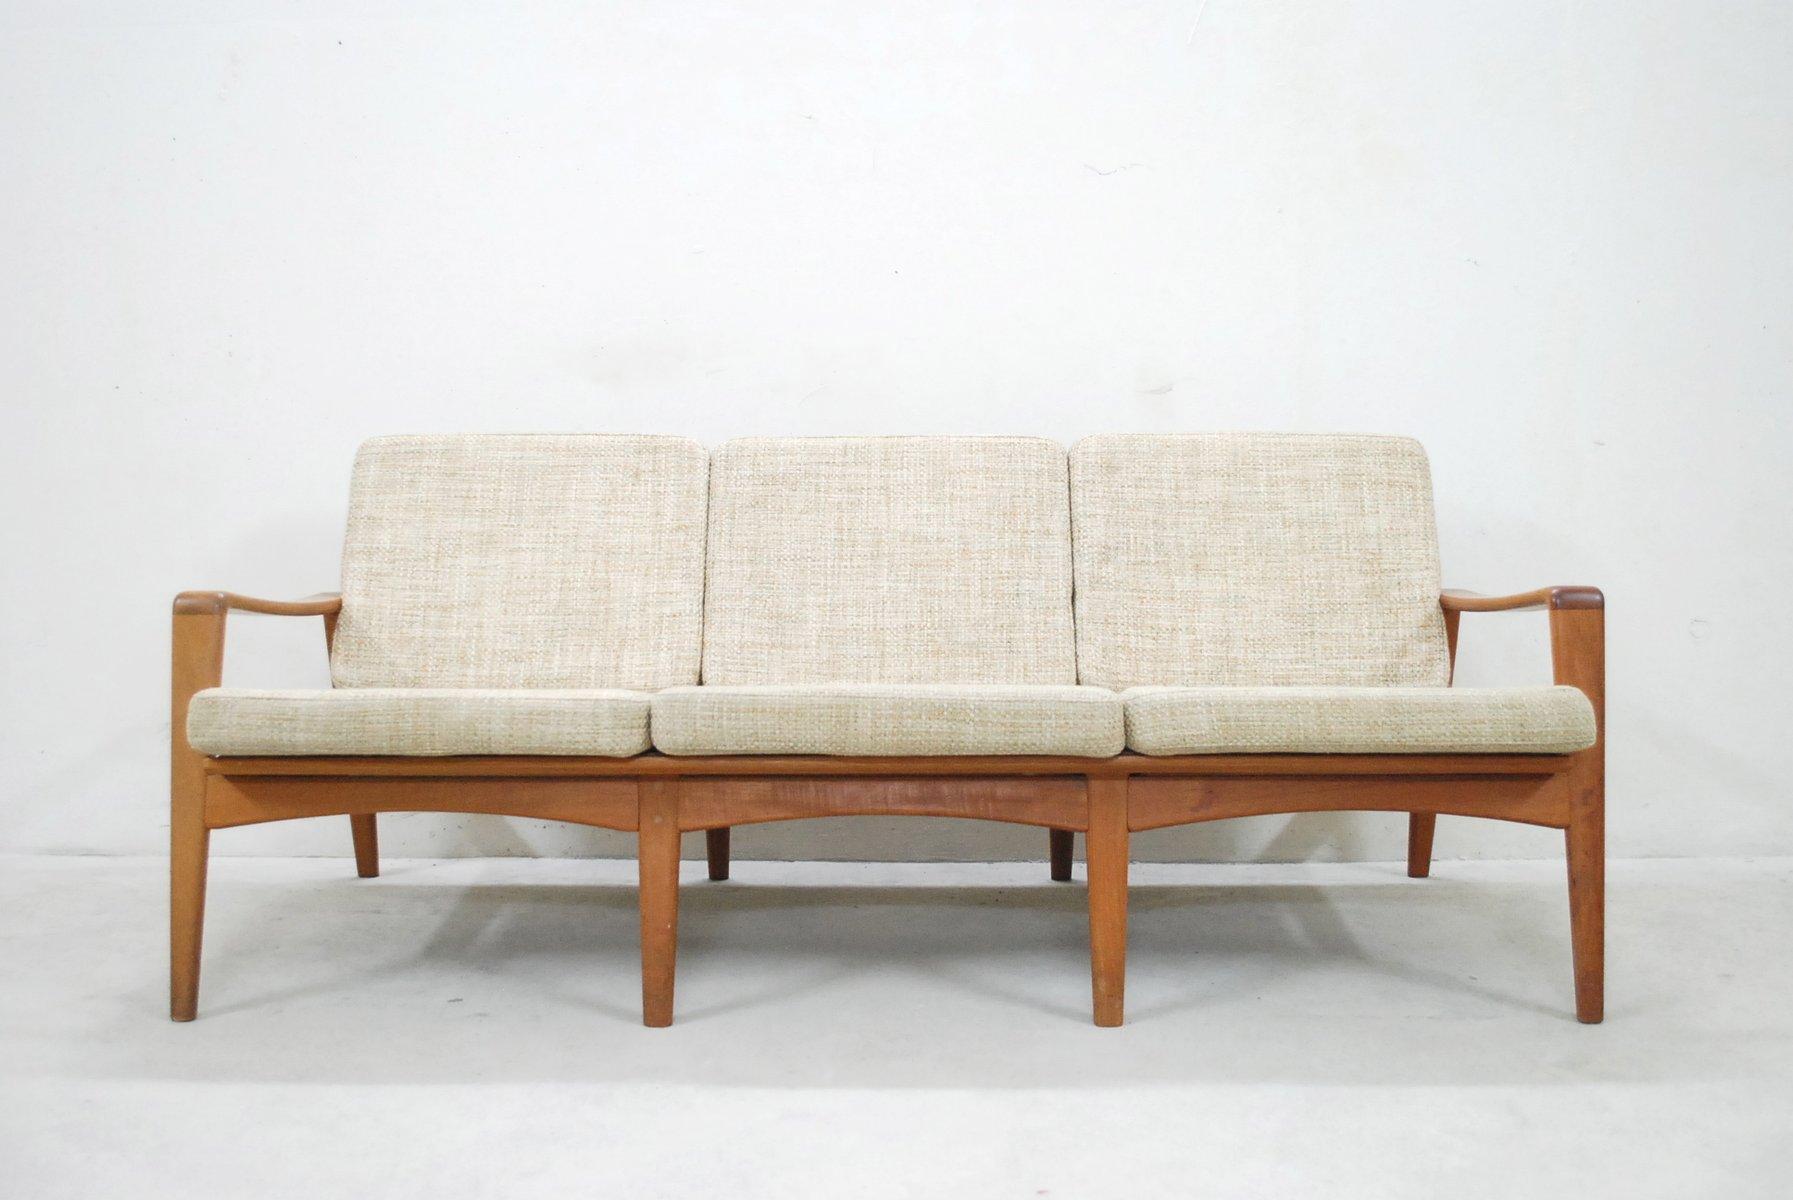 Designer Couch Modelle Komfort: Design Recamiere